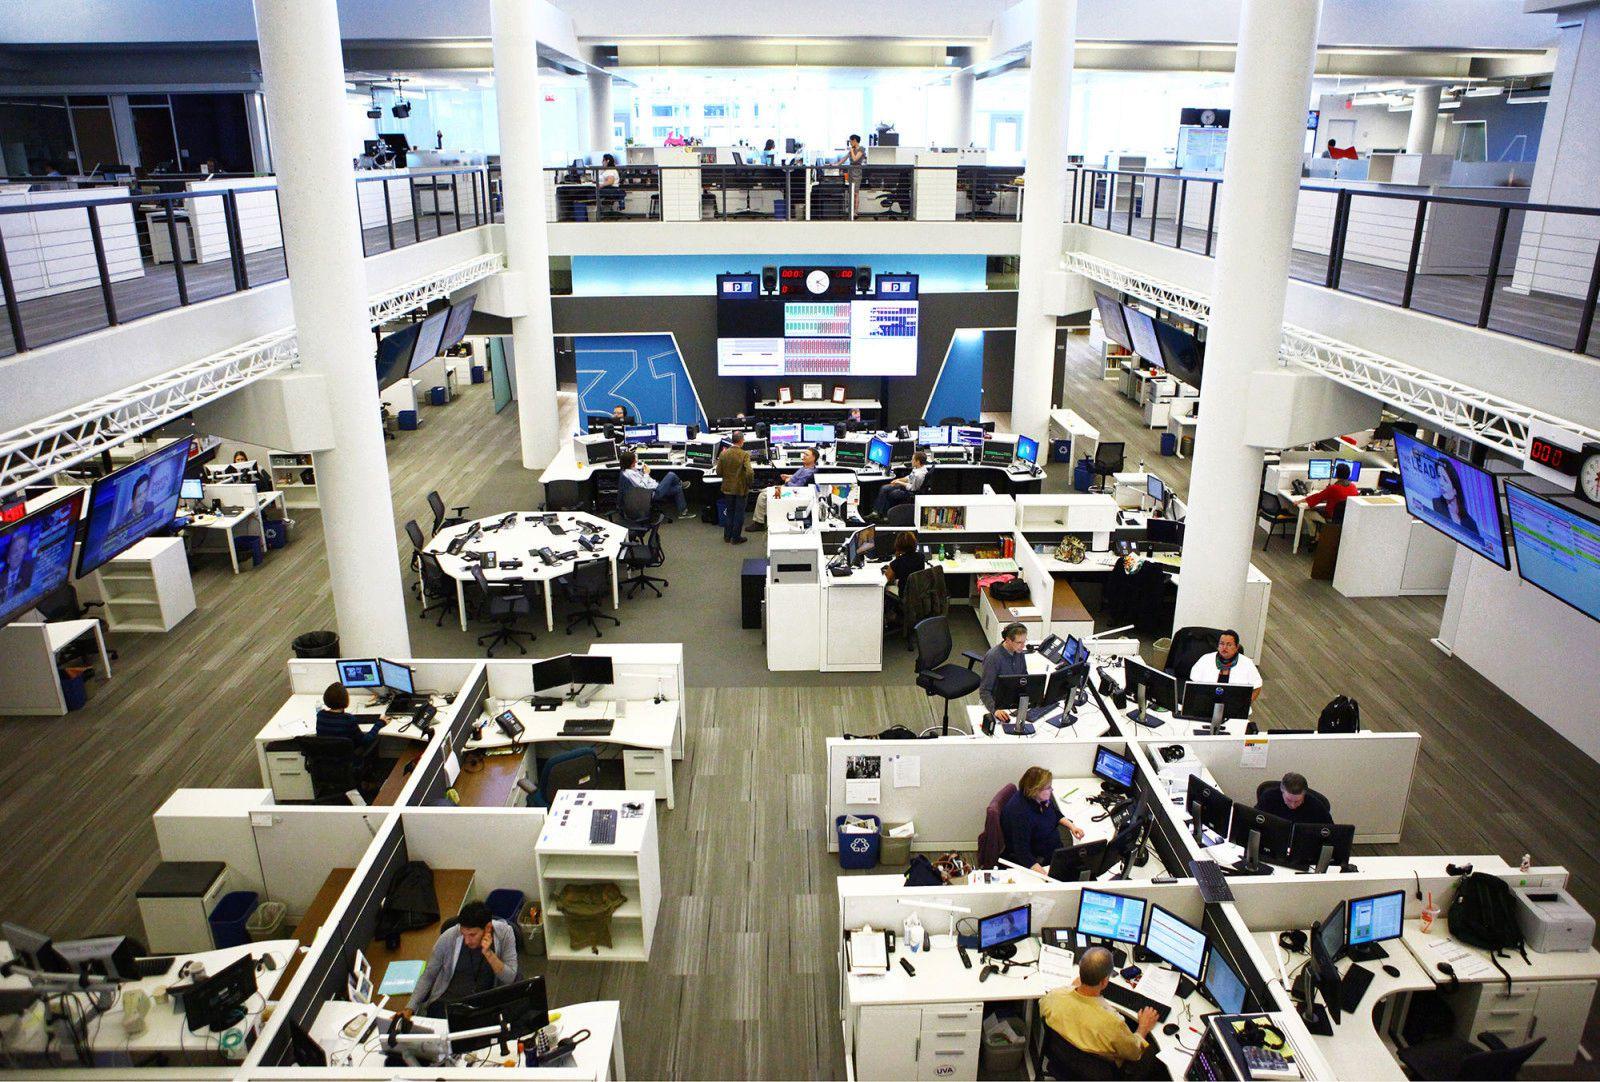 NPR Newsroom- Overnight News Coverage: The NPR Standard